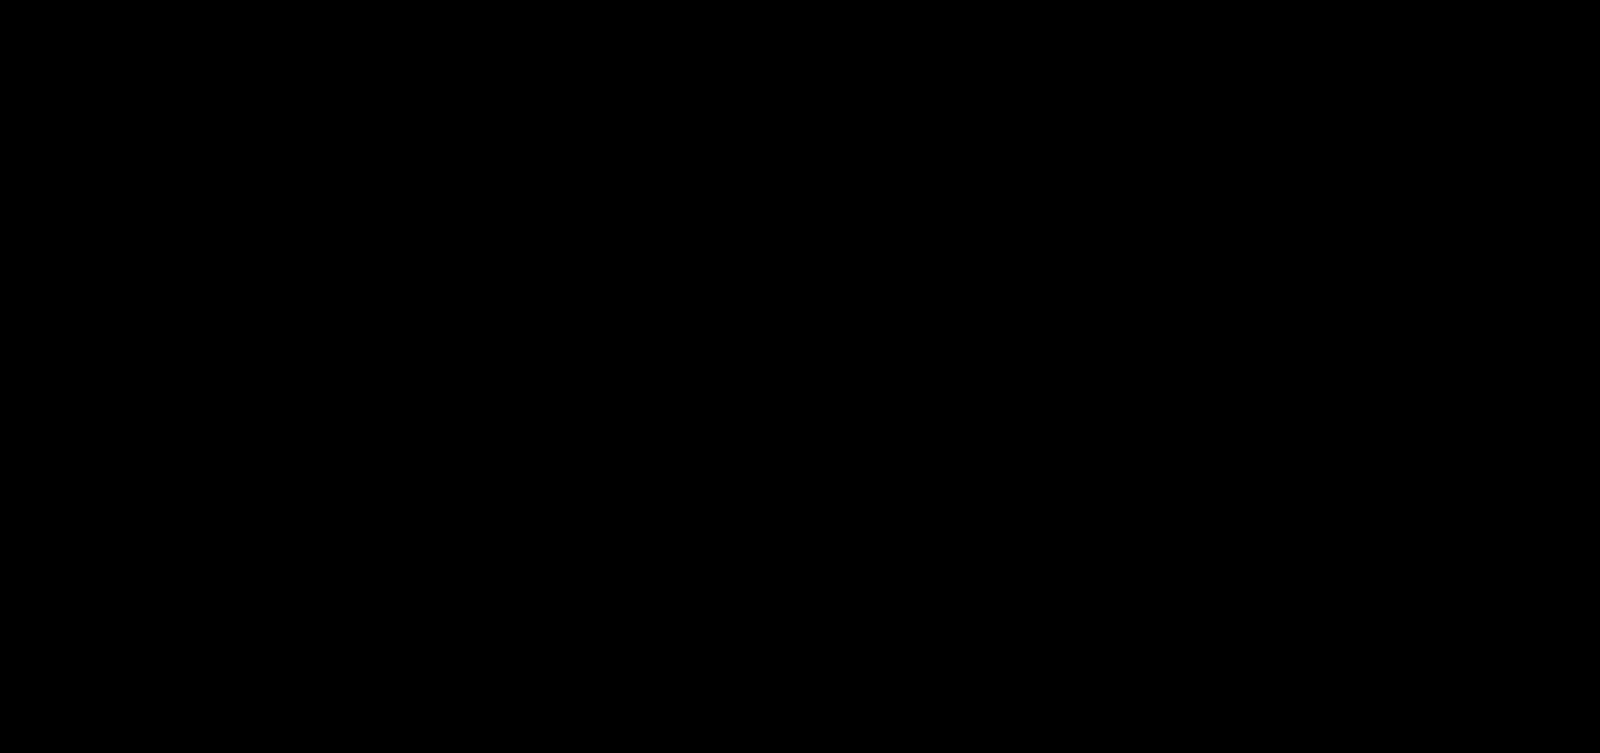 Viikinki Symbolit